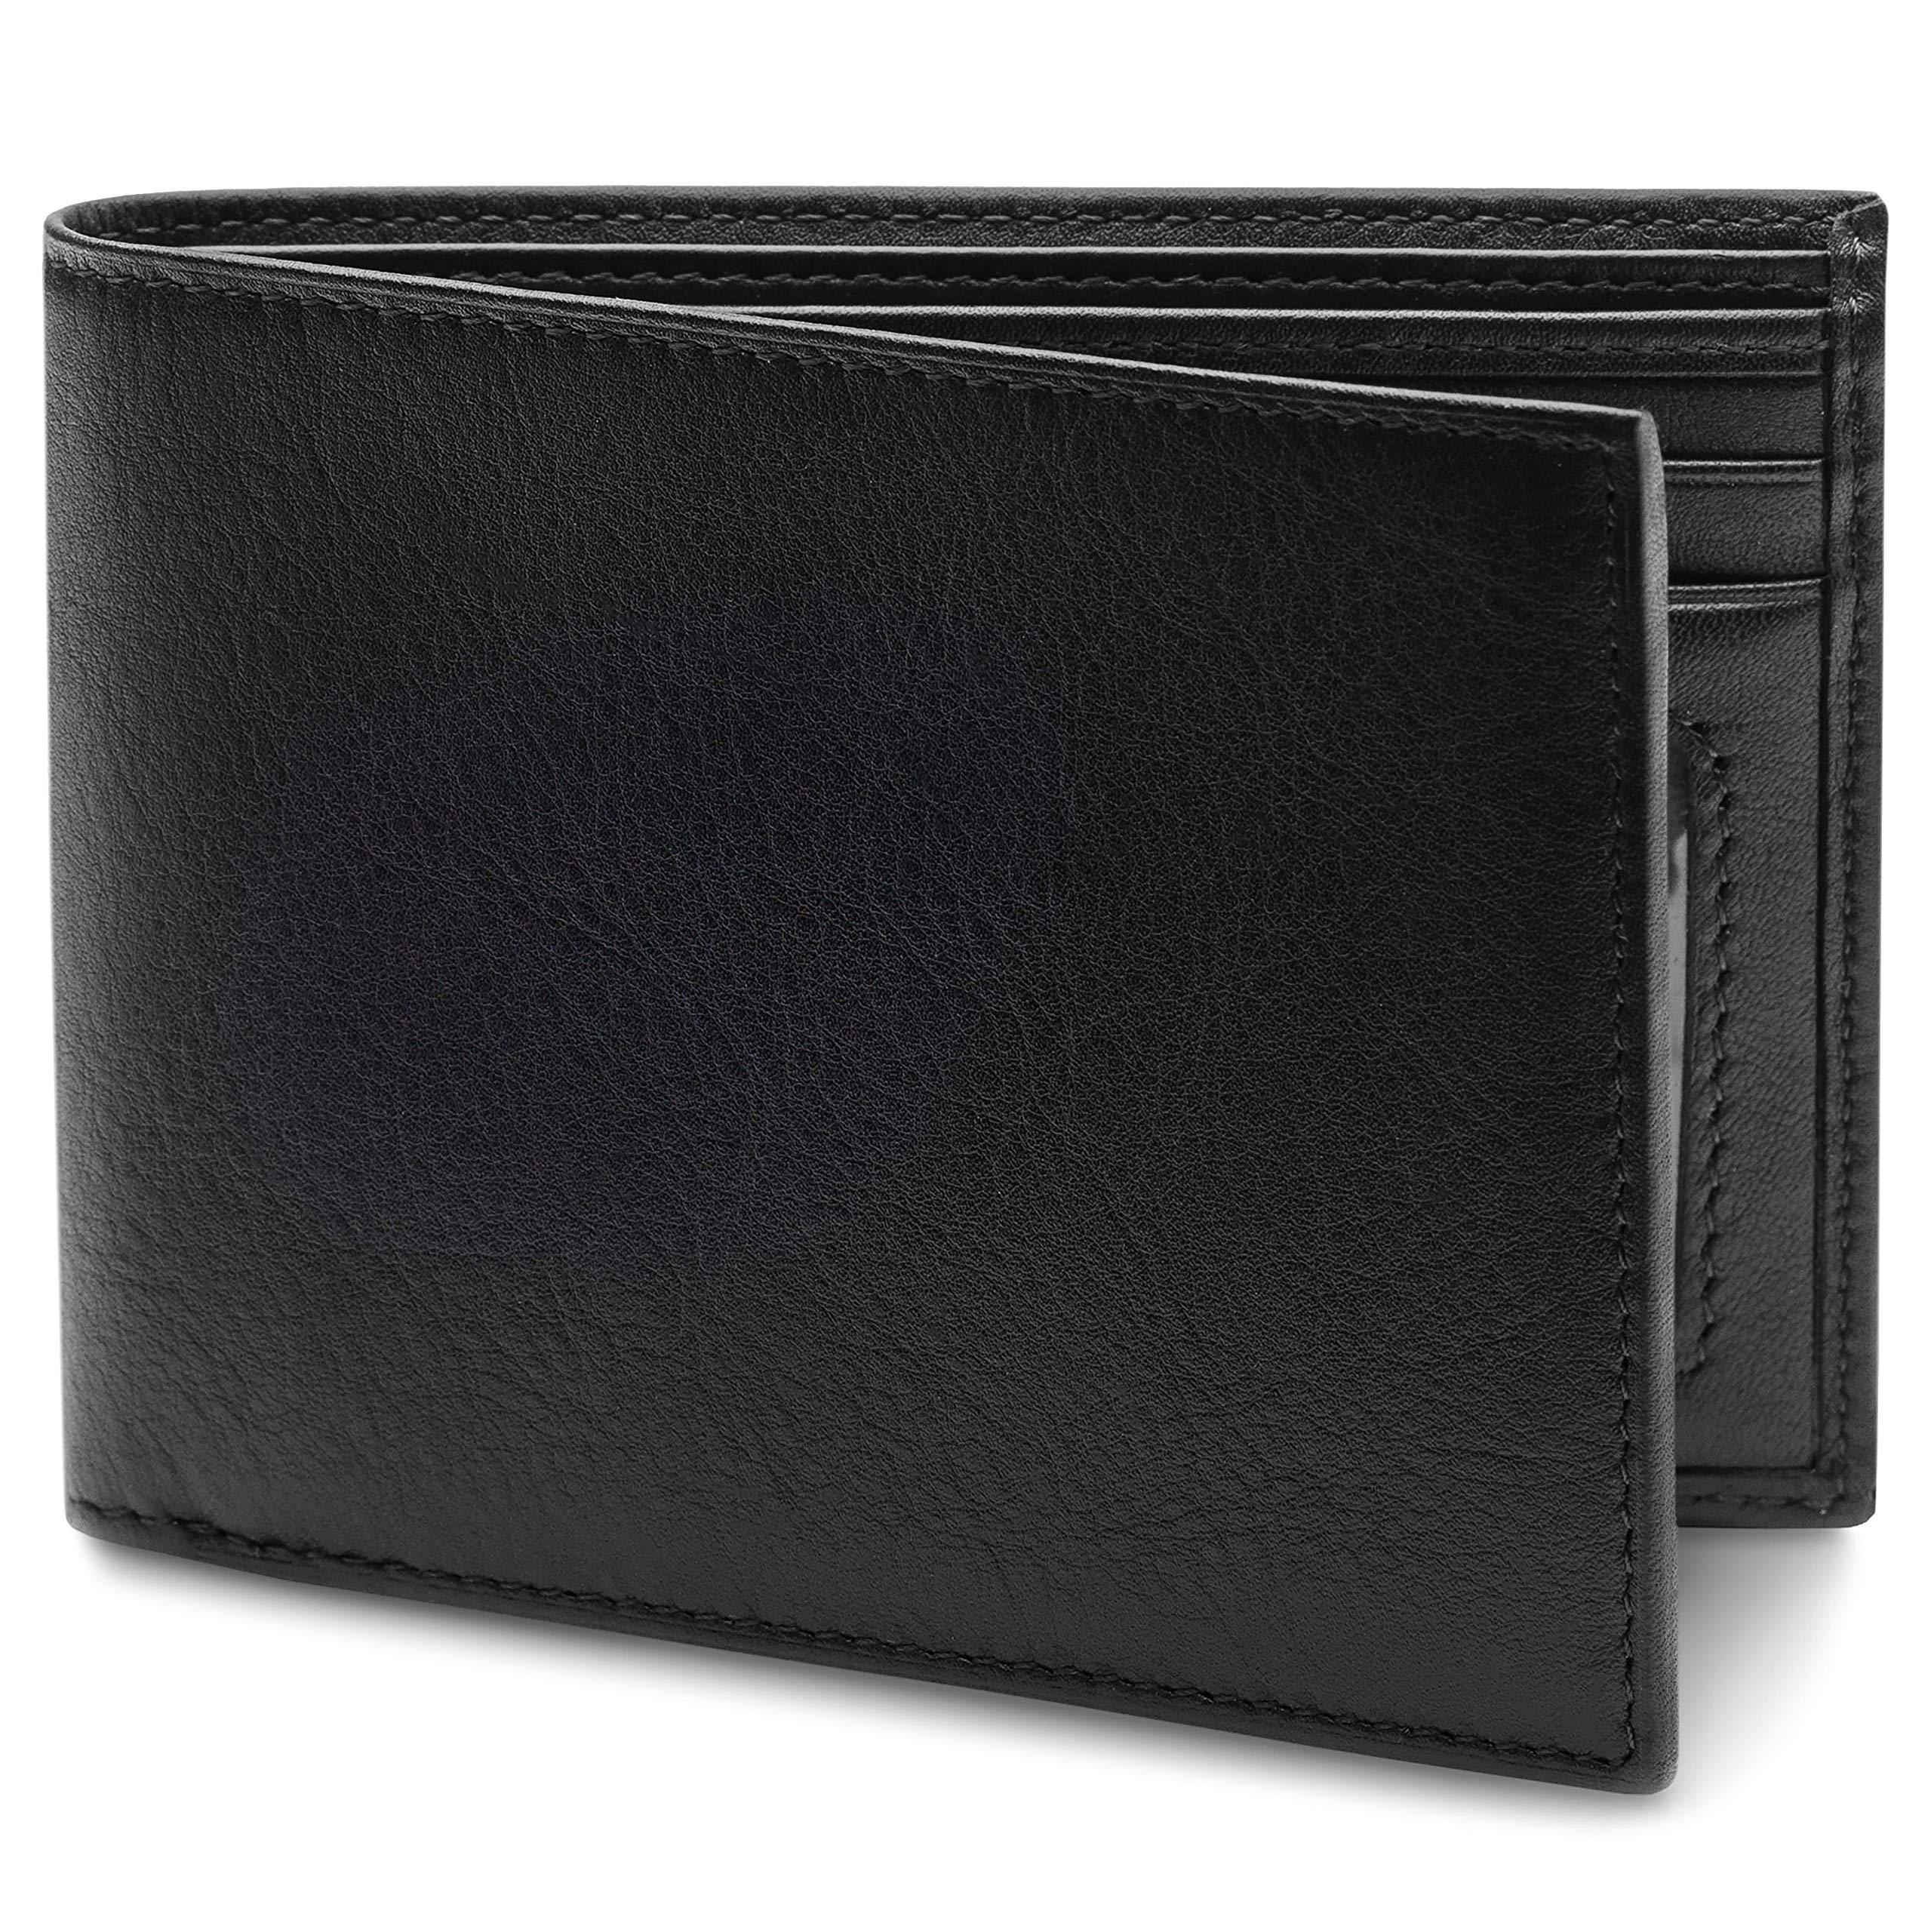 Bosca Men's Nappa Vitello Collection-Executive ID Wallet, Black, One Size by Bosca